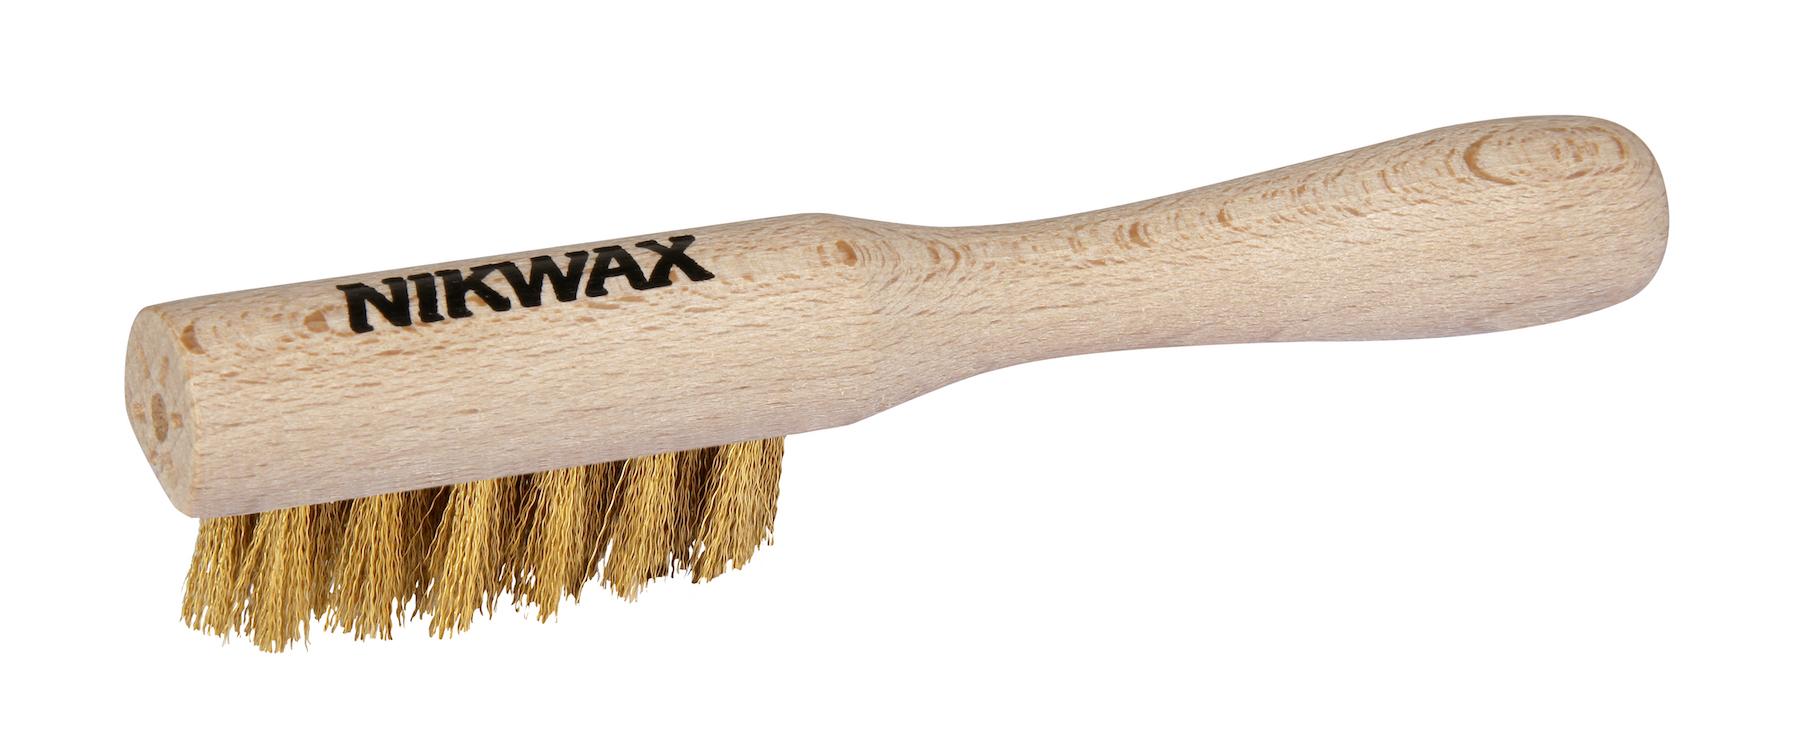 Nikwax - Brush Set for Nubuck shoes - Shoe care